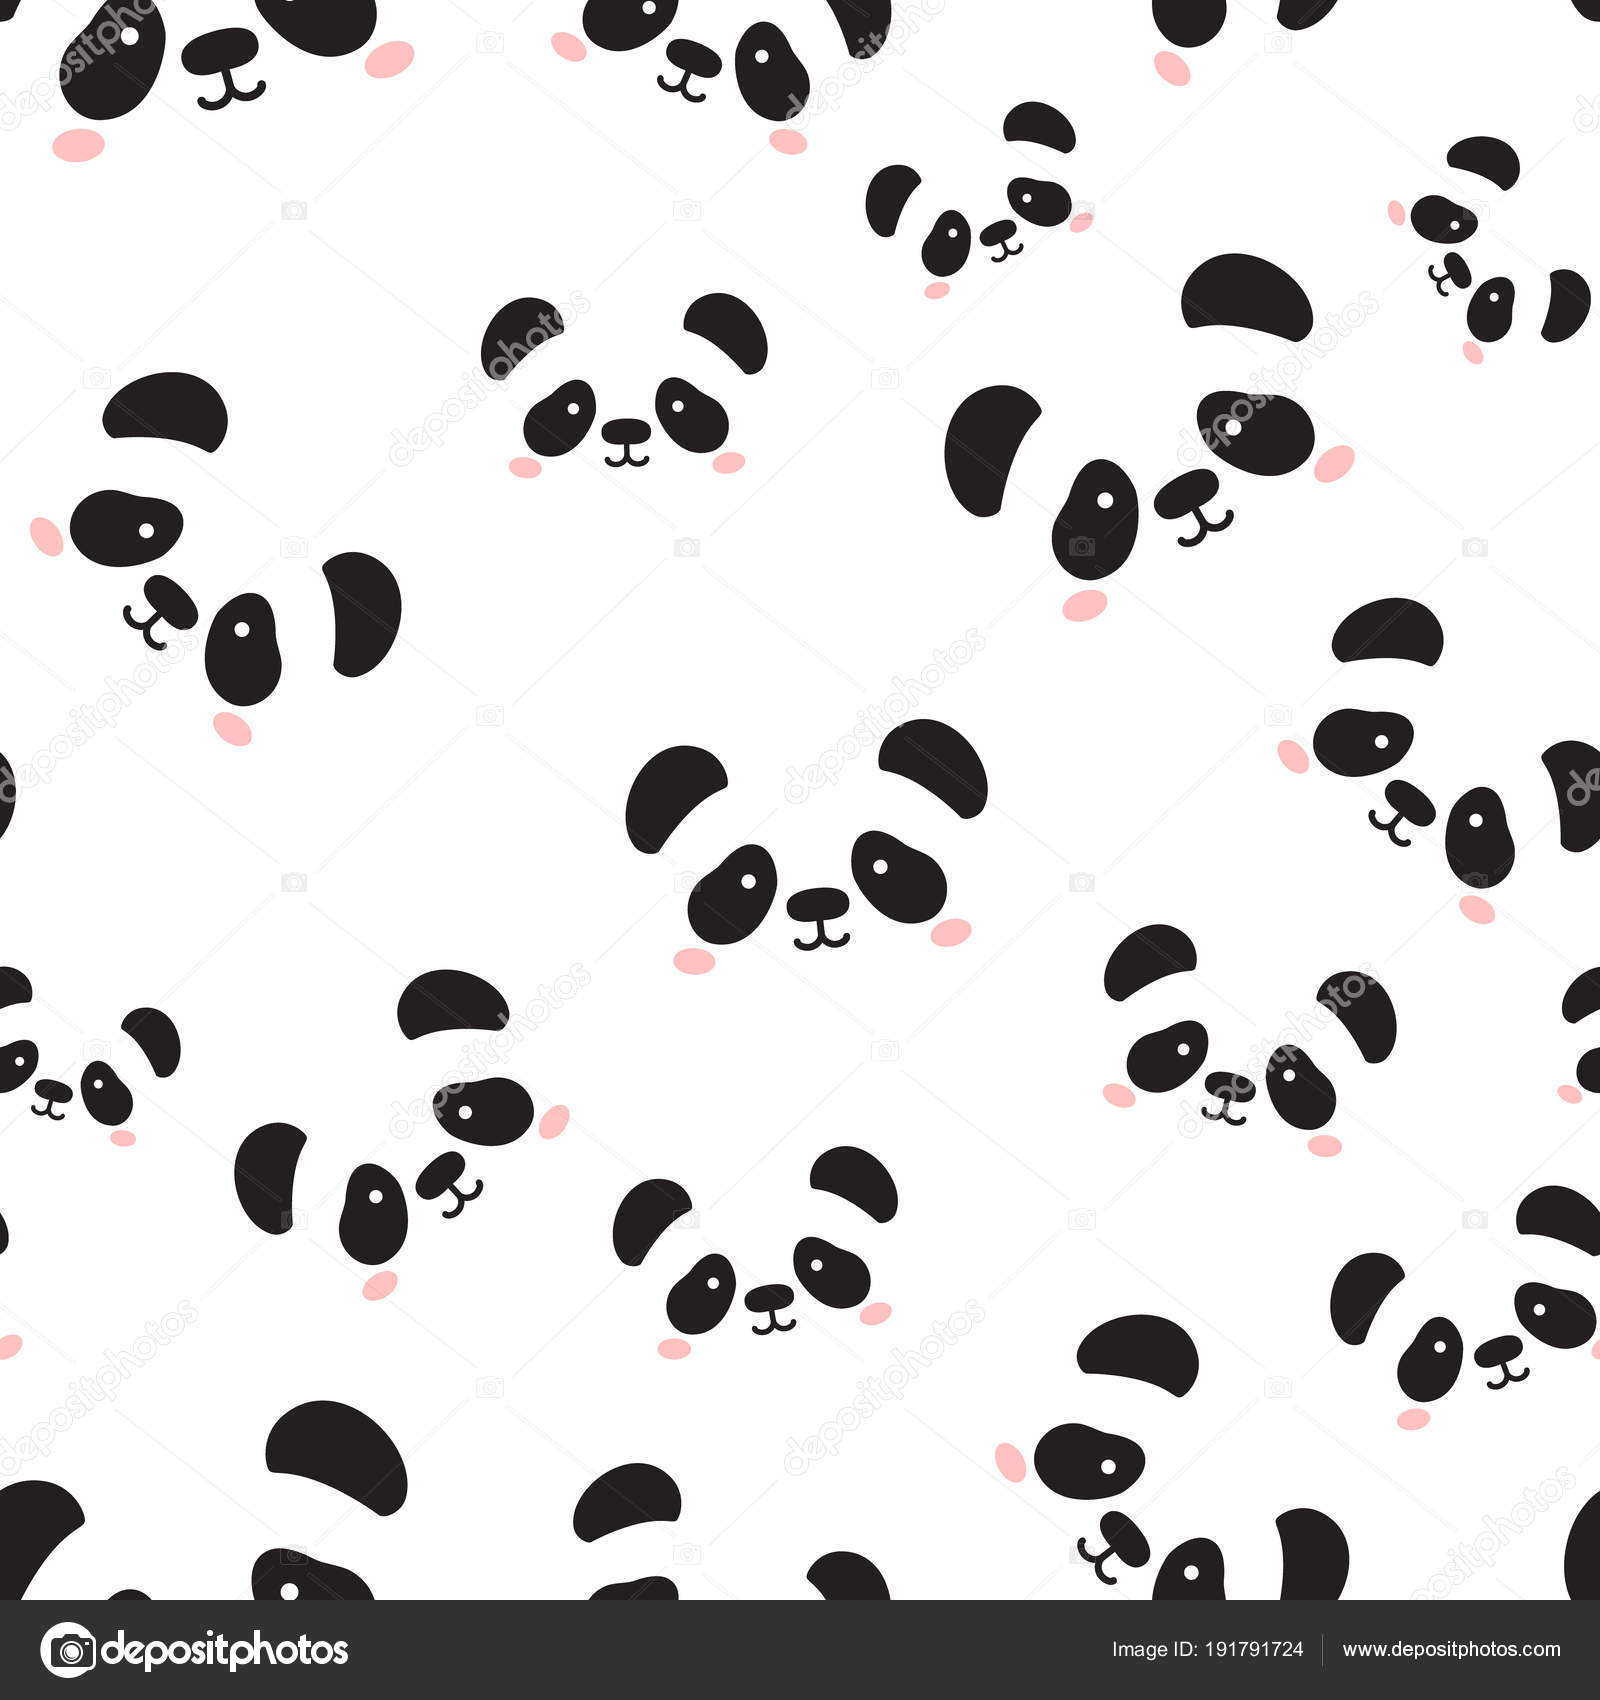 fondos pantalla la cara pintada cara de panda lindo fondo de